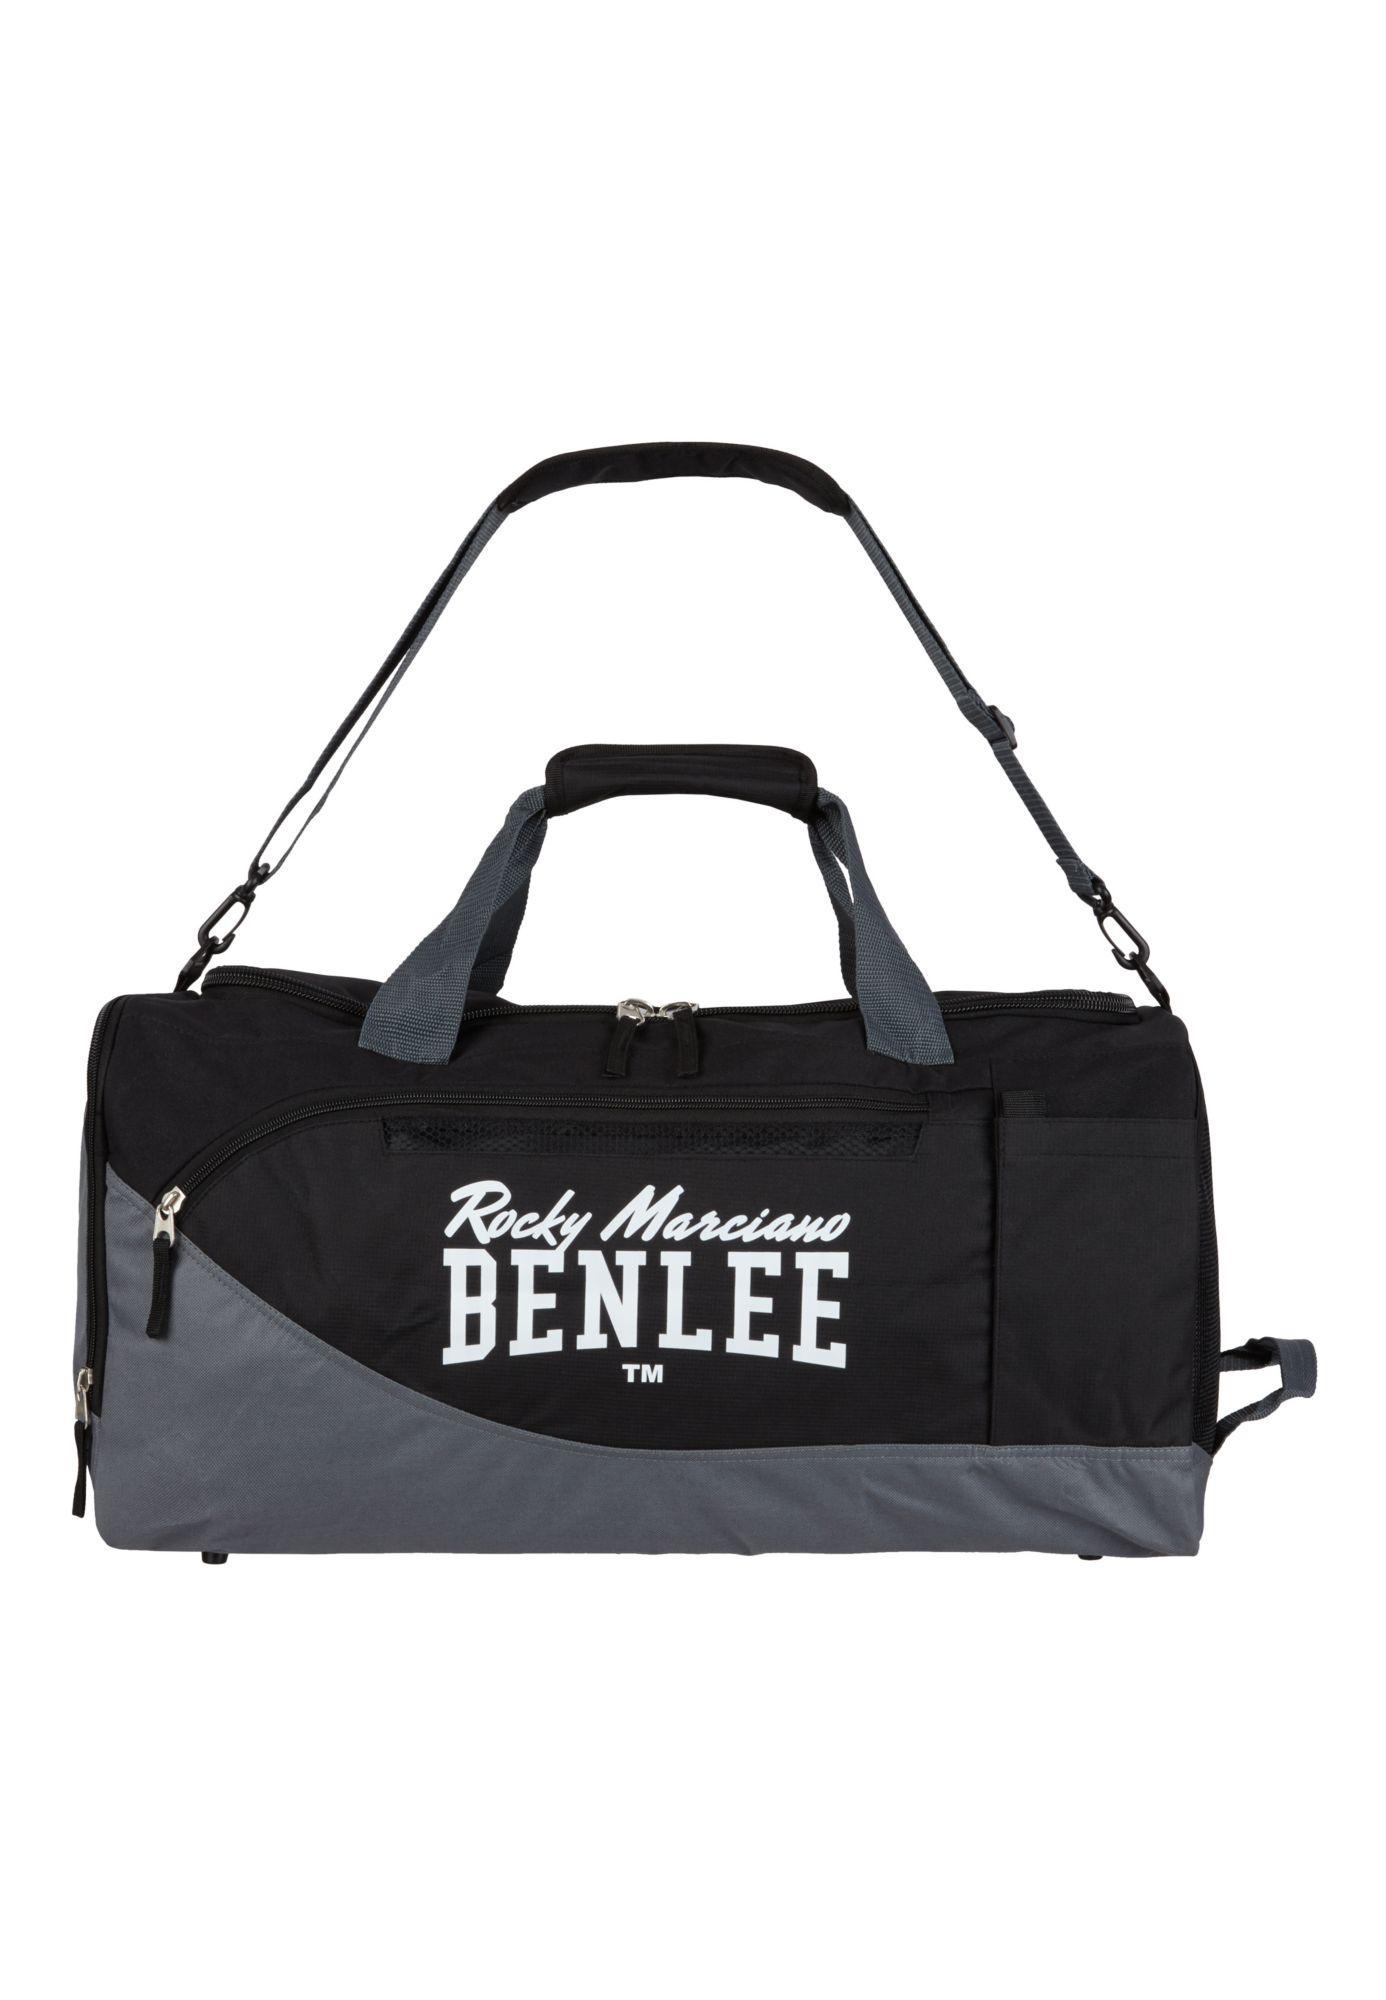 BENLEE ROCKY MARCIANO Benlee Rocky Marciano Tasche